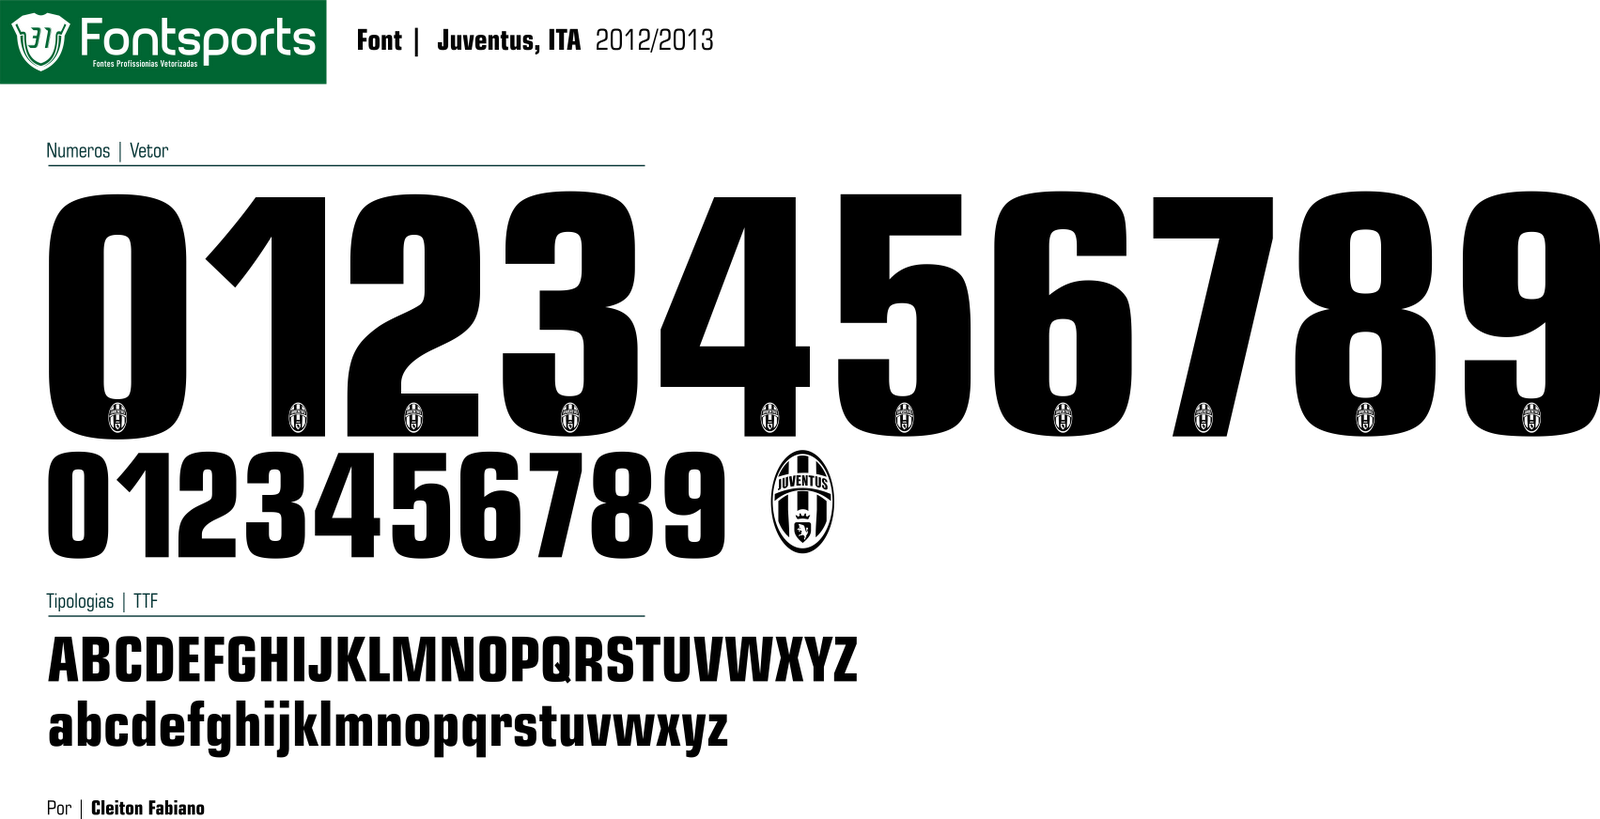 psg uniforme vector